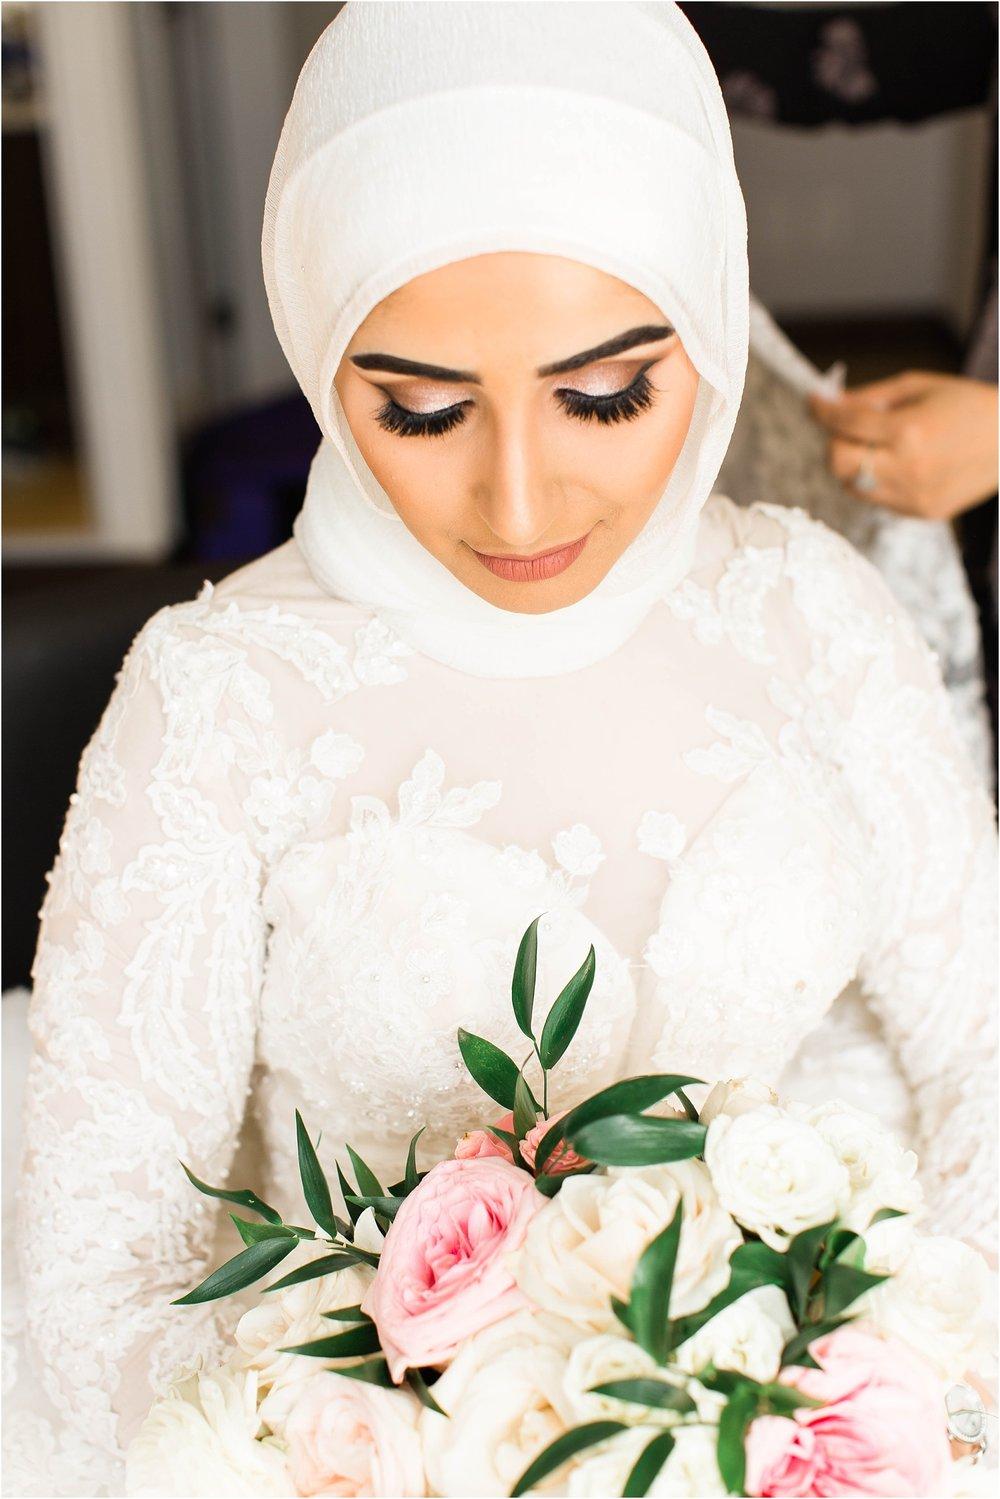 Red-Rose-Convention-Mint-Room-Wedding-Toronto-Mississauga-Brampton-Scarborough-GTA-Pakistani-Indian-Wedding-Engagement-Photographer-Photography_0089.jpg